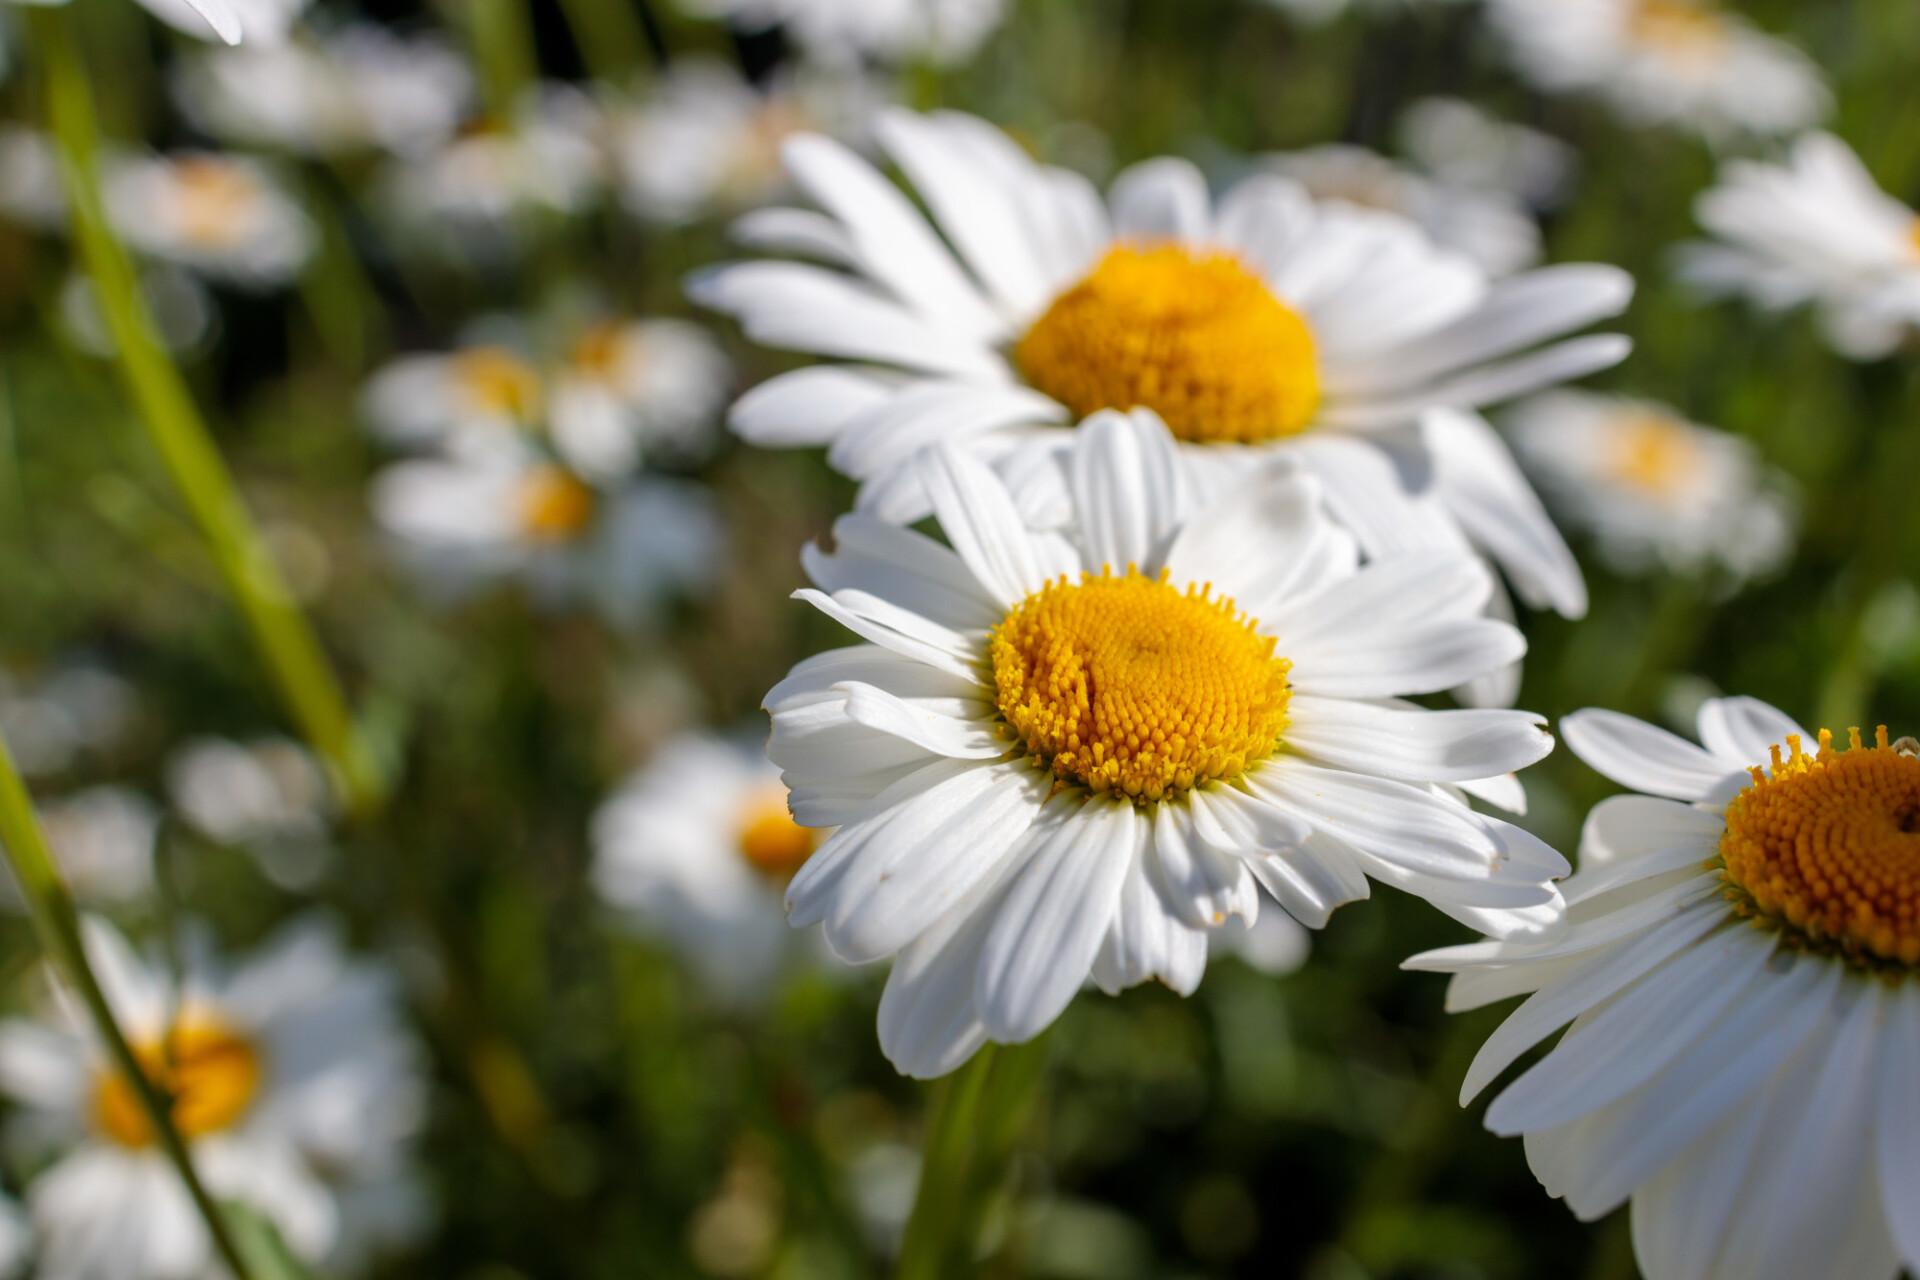 Leucanthemum - Marguerite flower